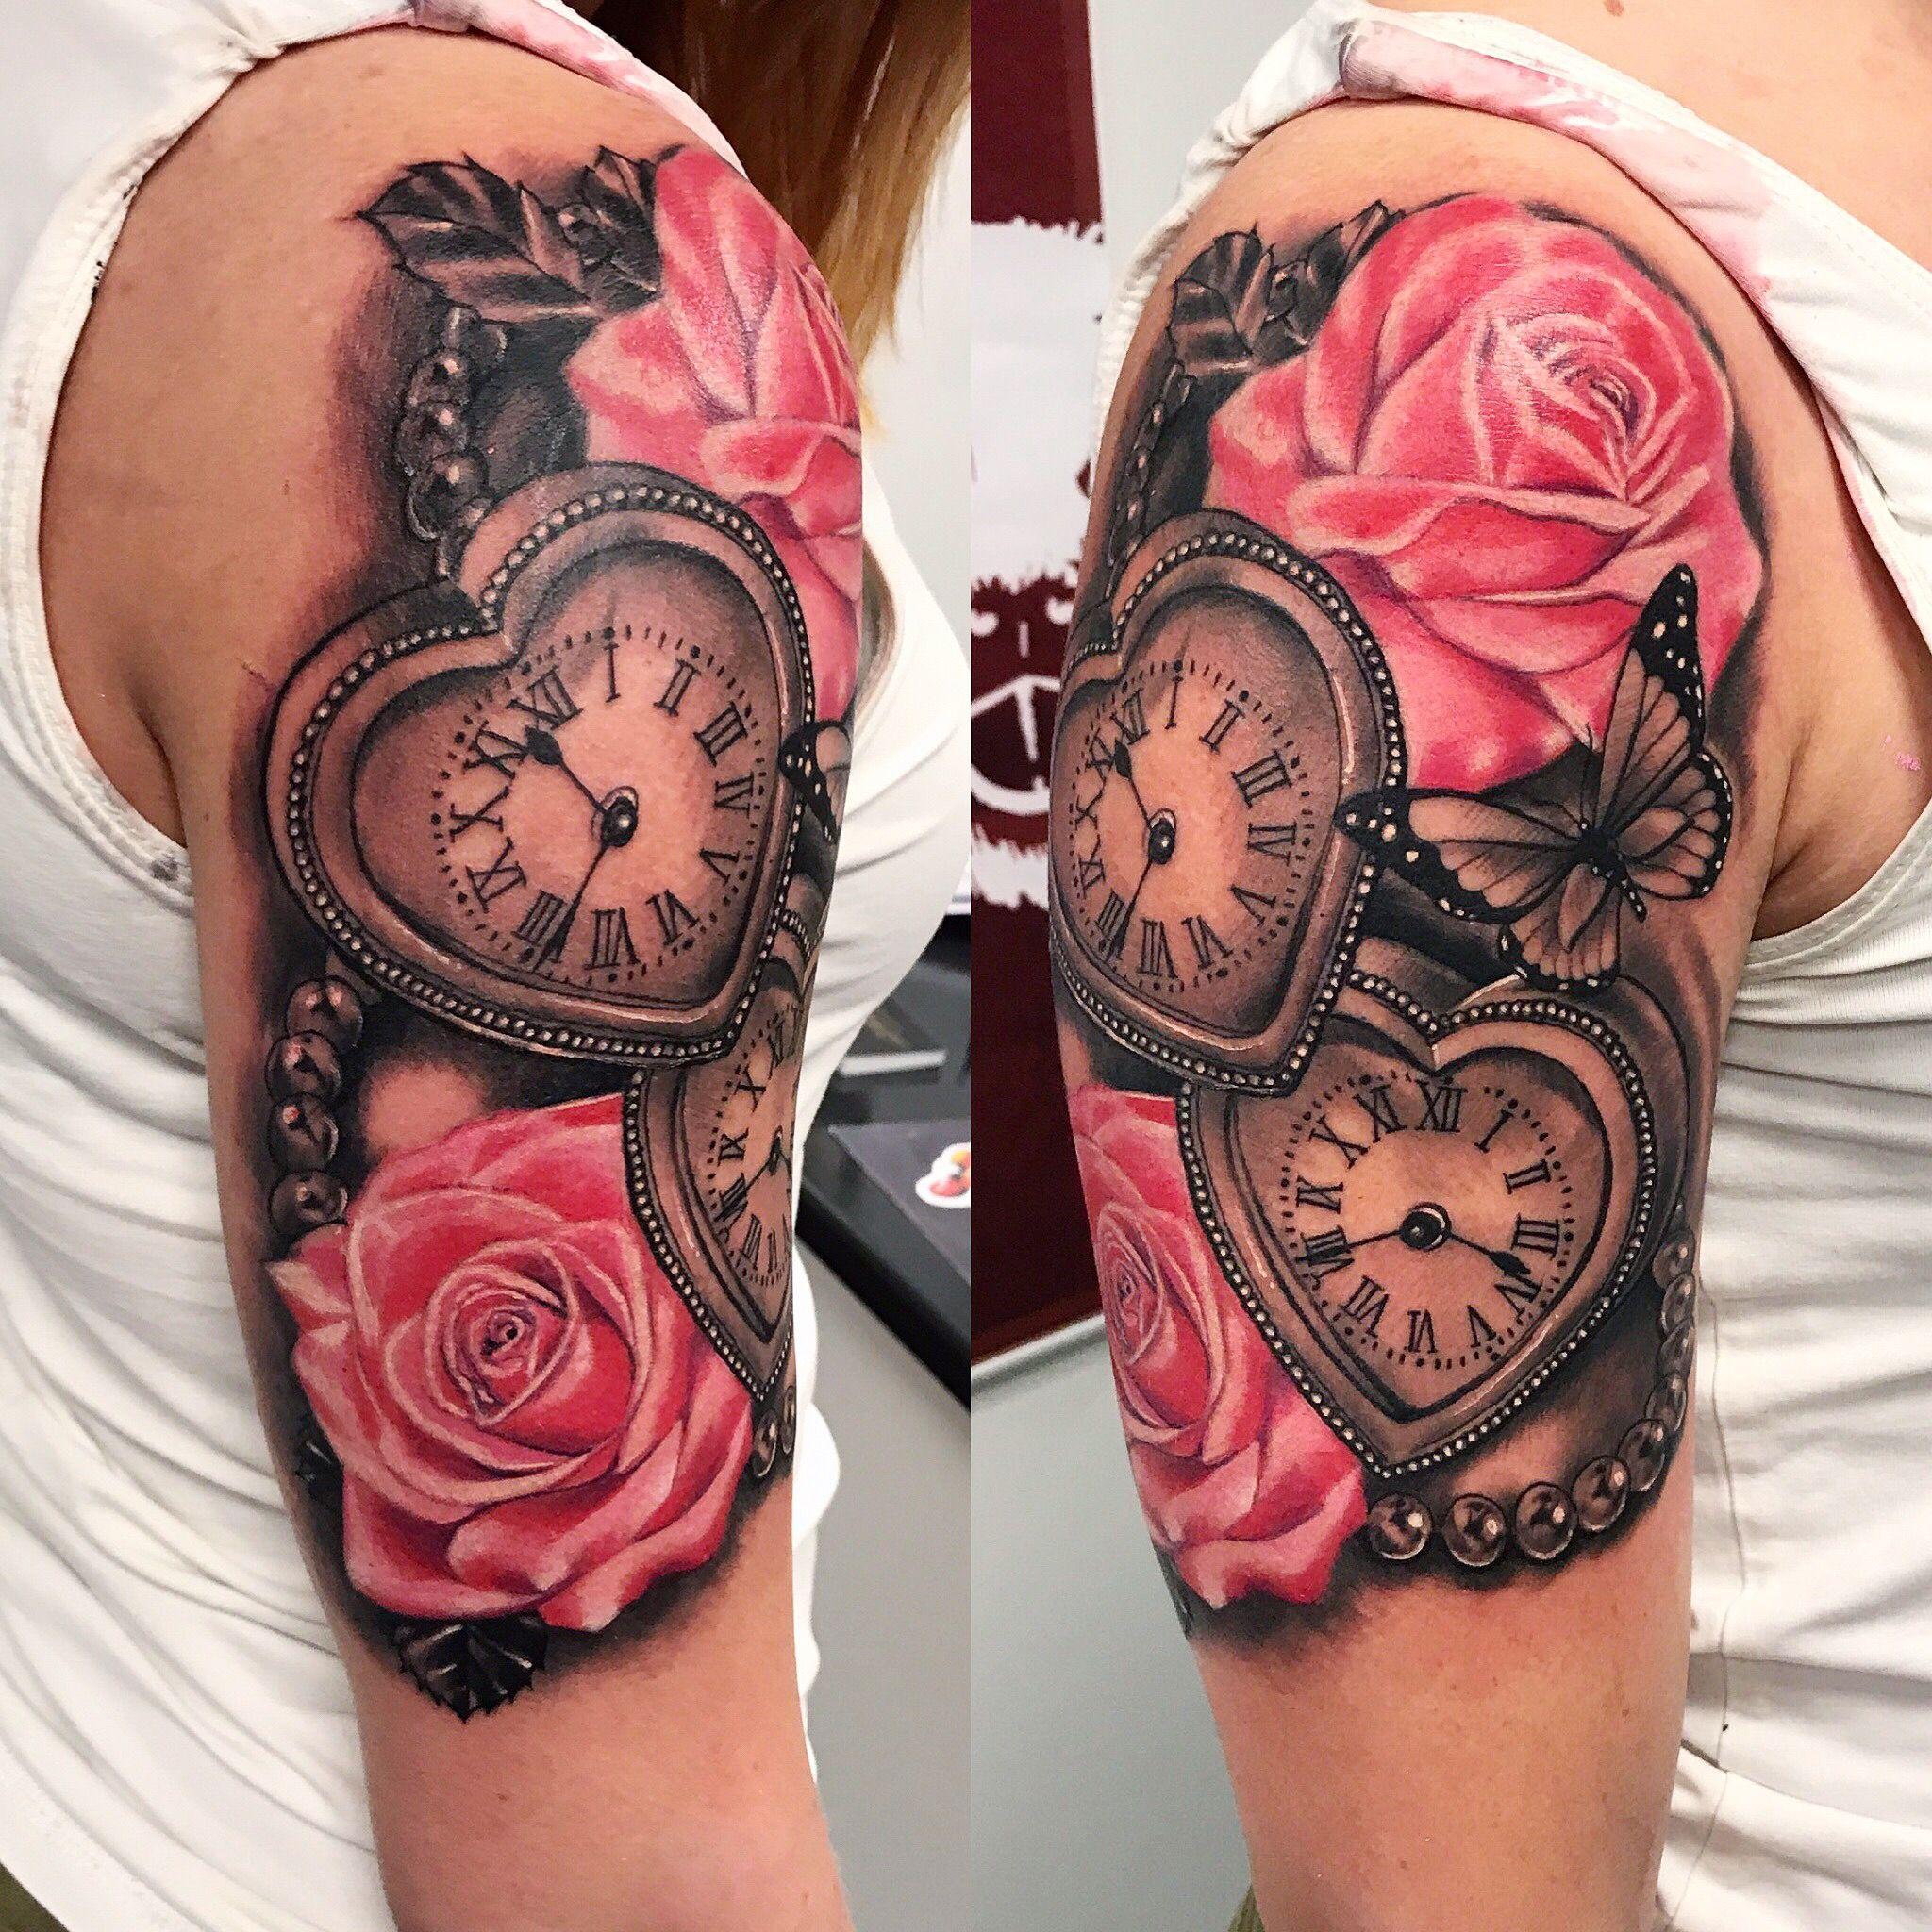 Feminine Heart Clock Tattoo